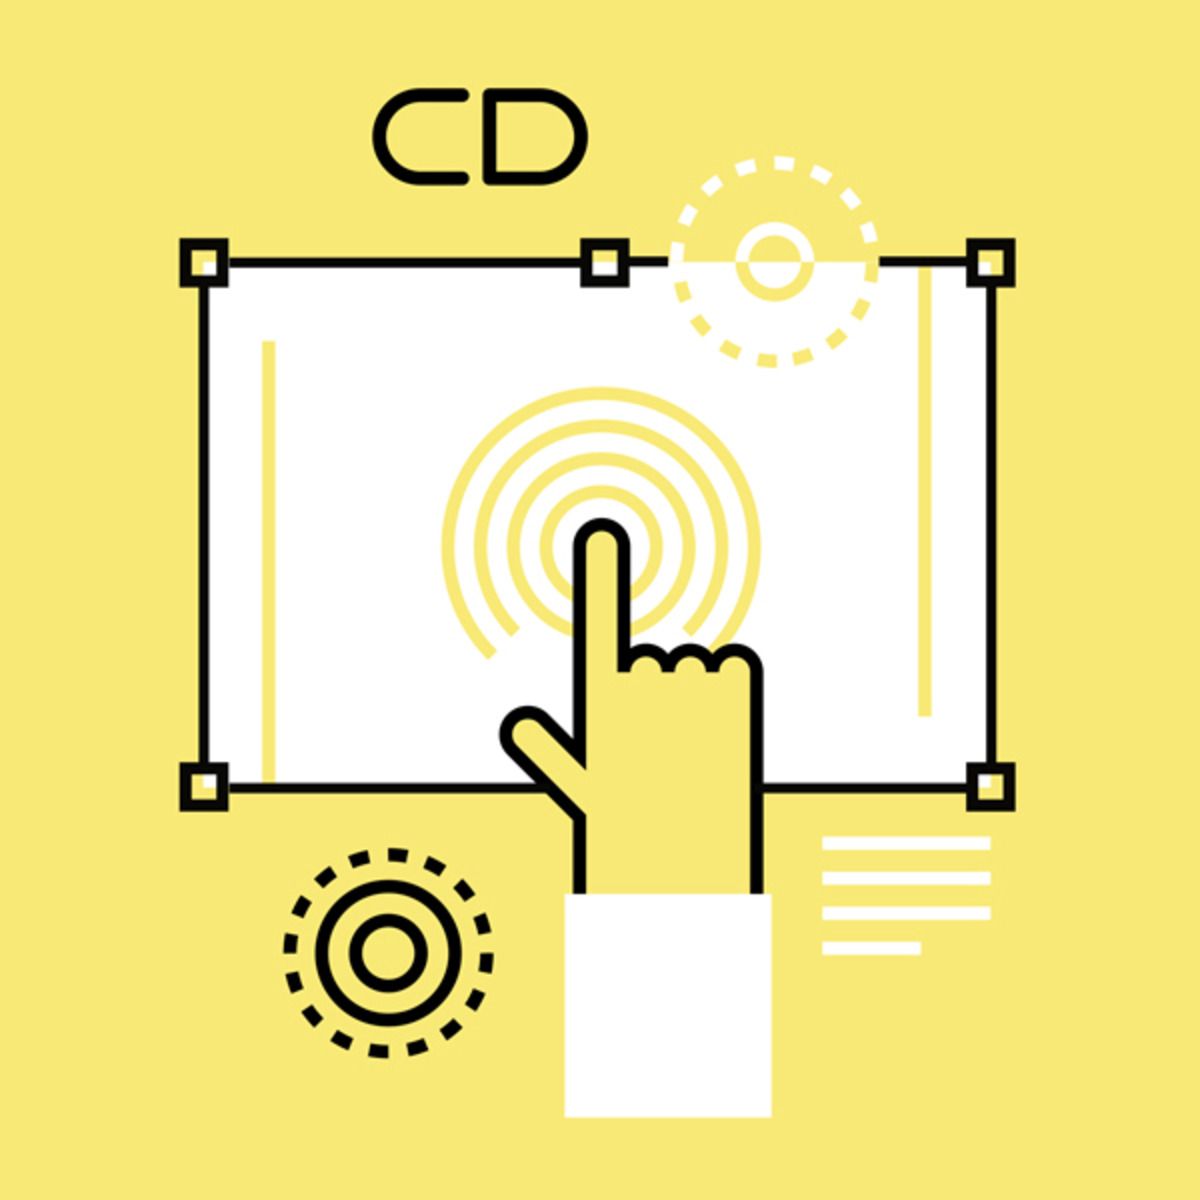 Создание концепции интерфейса course image